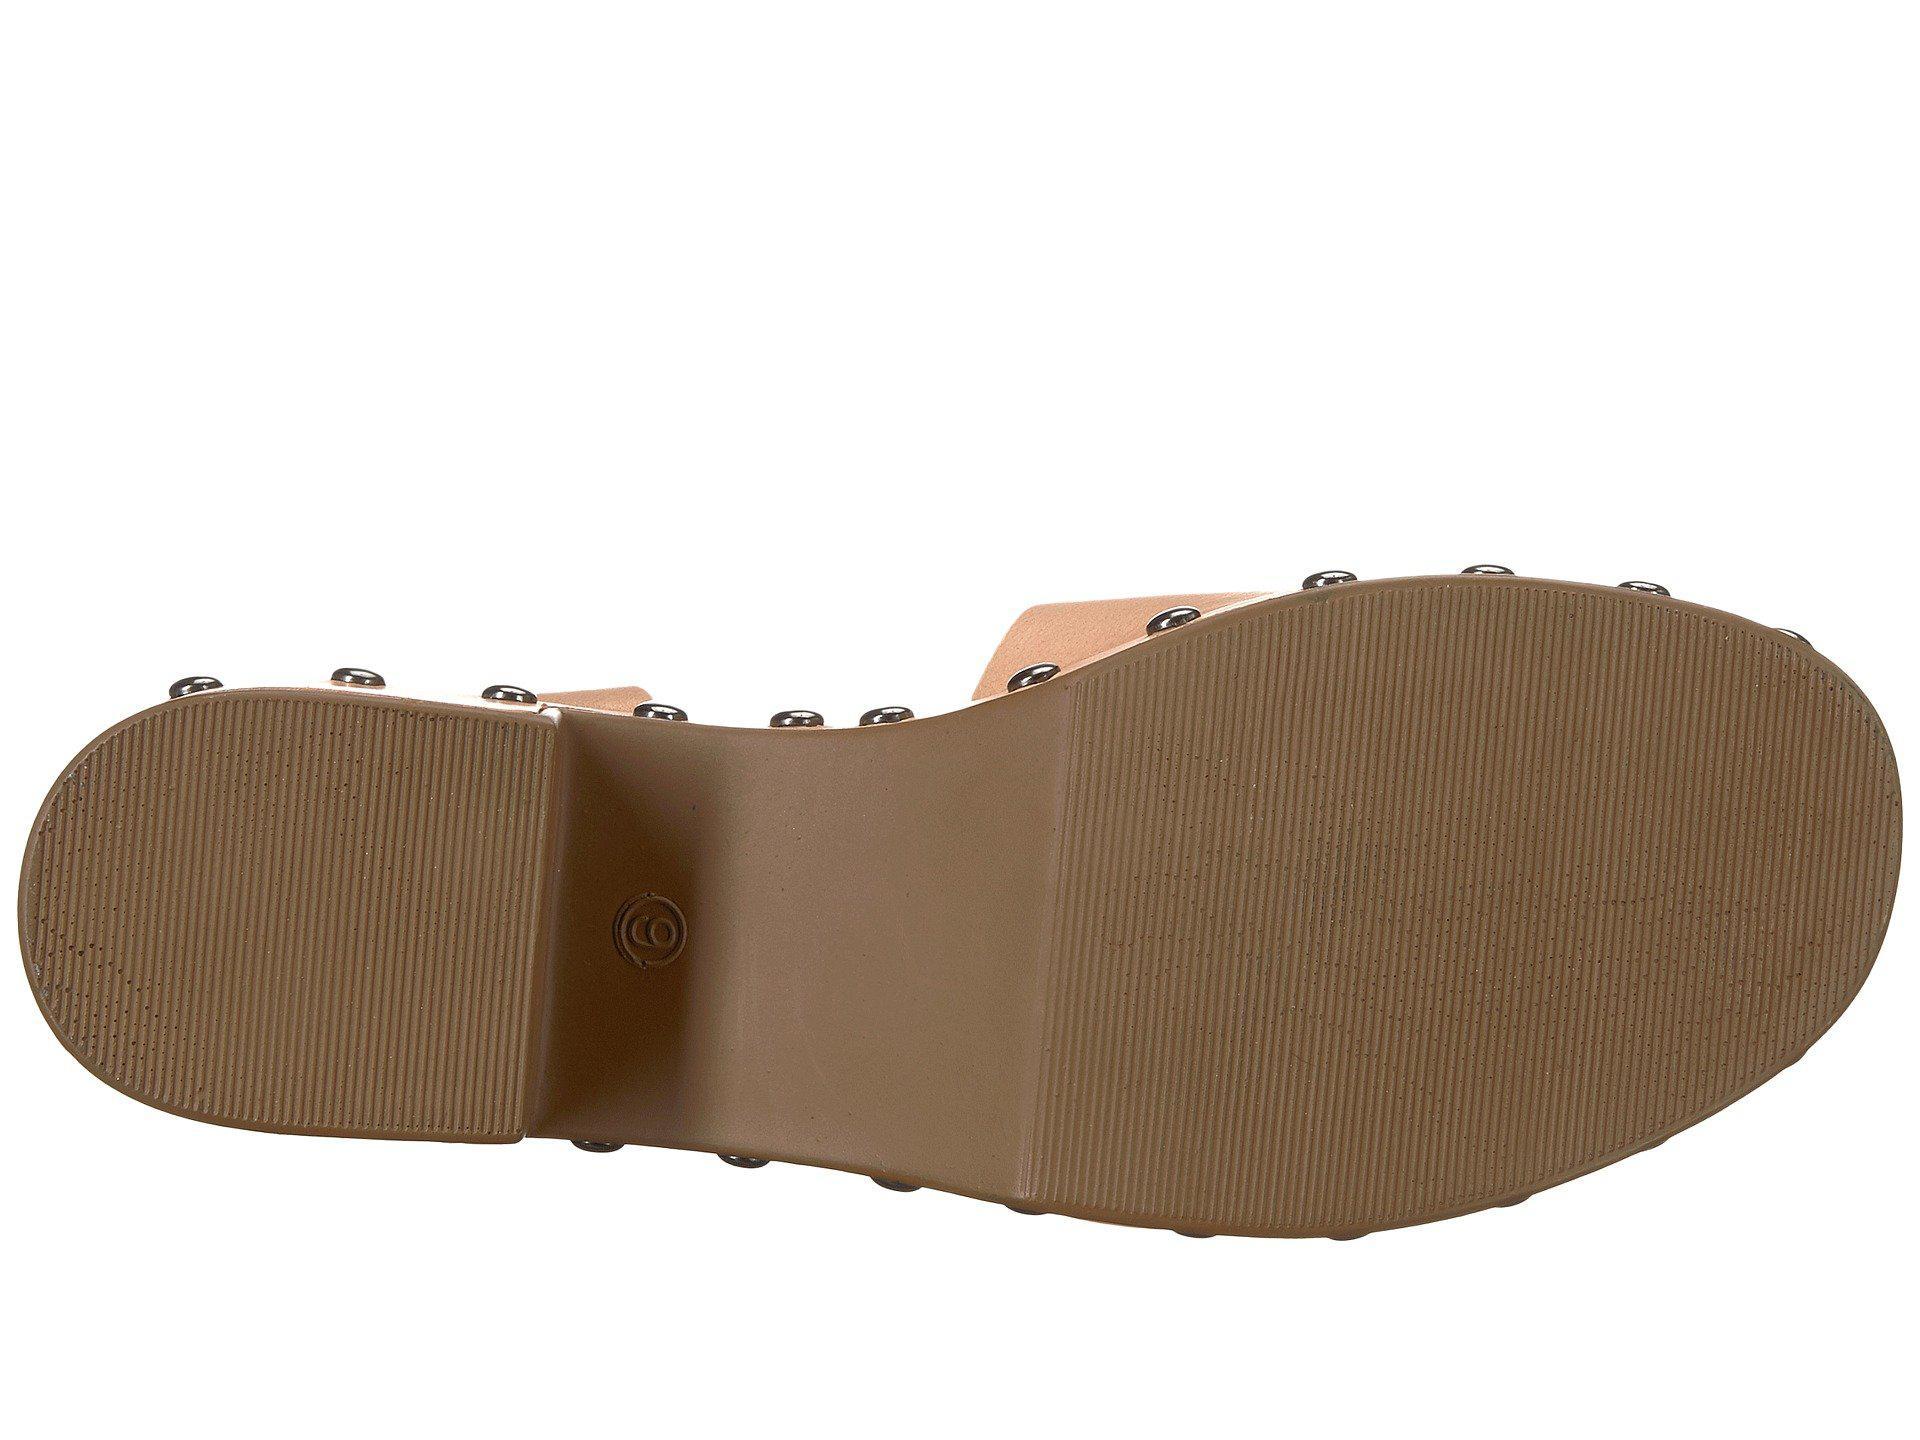 a7f54cc9633 Seychelles - Multicolor Spare Moments (vacchetta) Women s 1-2 Inch Heel  Shoes -. View fullscreen